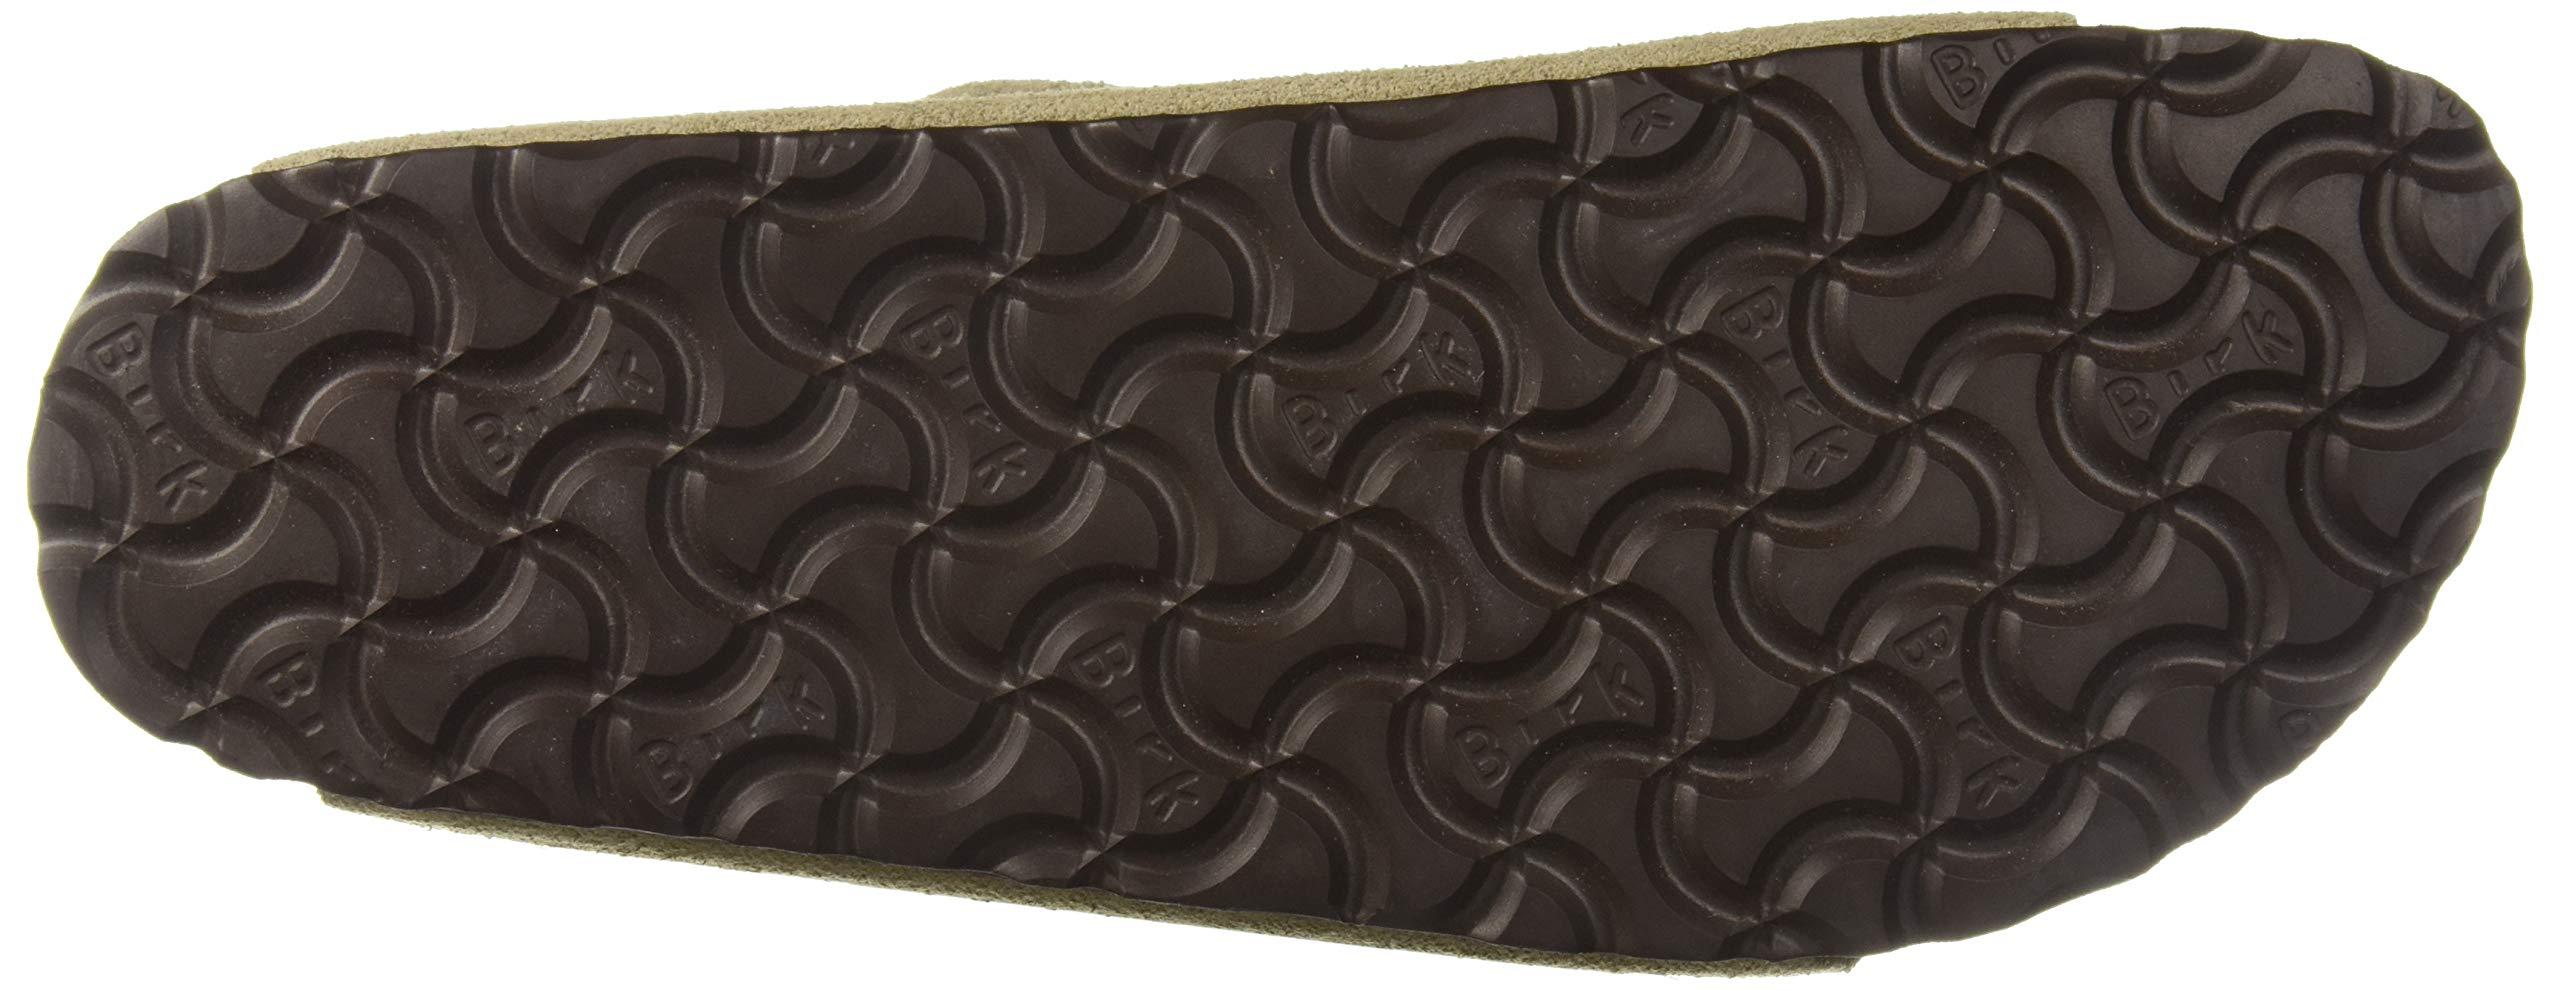 Birkenstock Arizona Soft Footbed Taupe Suede Regular Width - EU Size 35 / Women's US Sizes 4-4.5 by Birkenstock (Image #3)